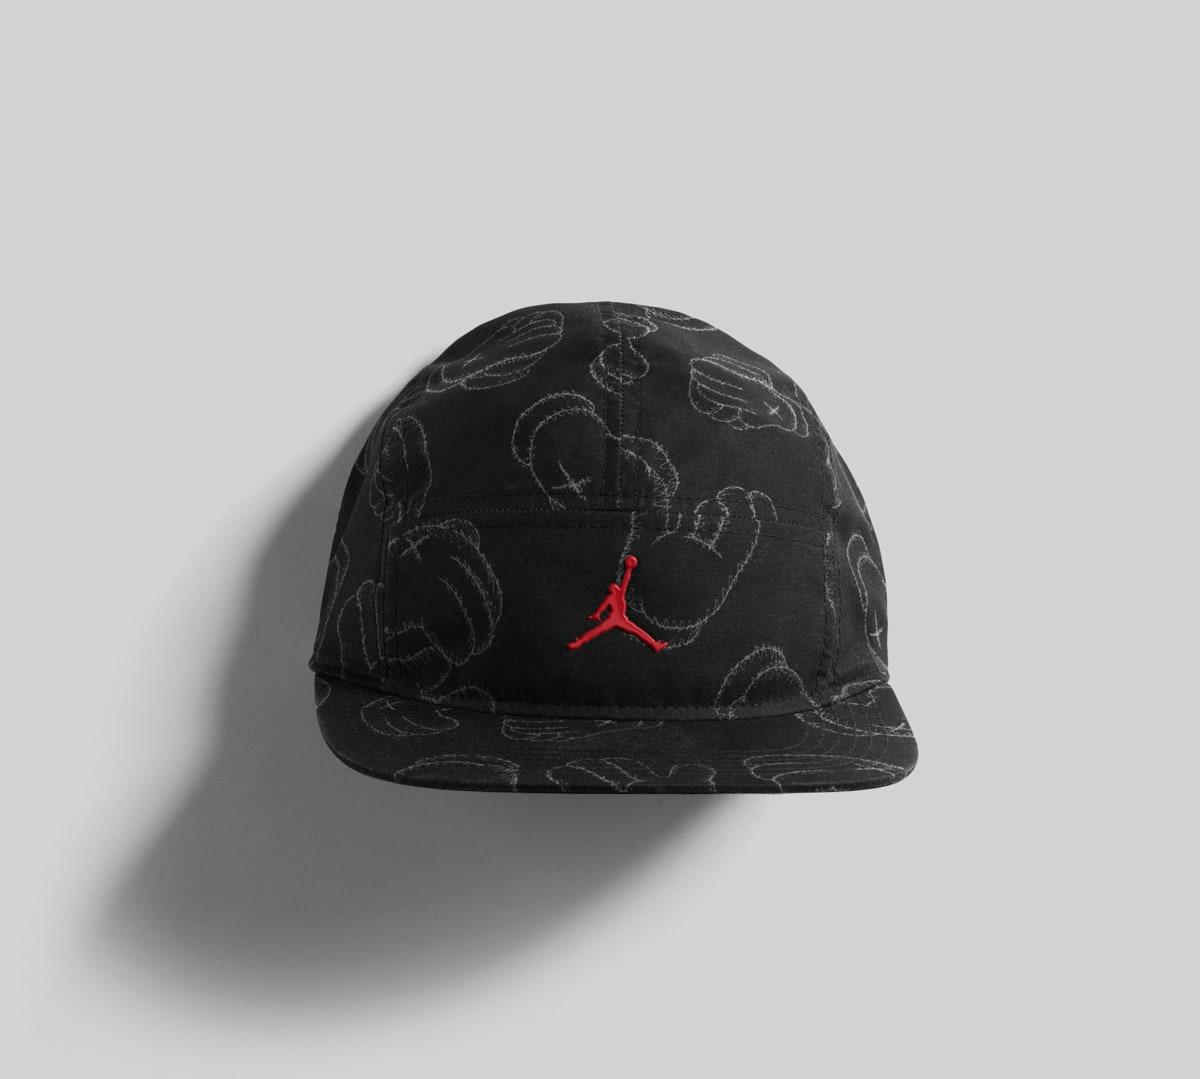 jordan-brand-kaws-hat